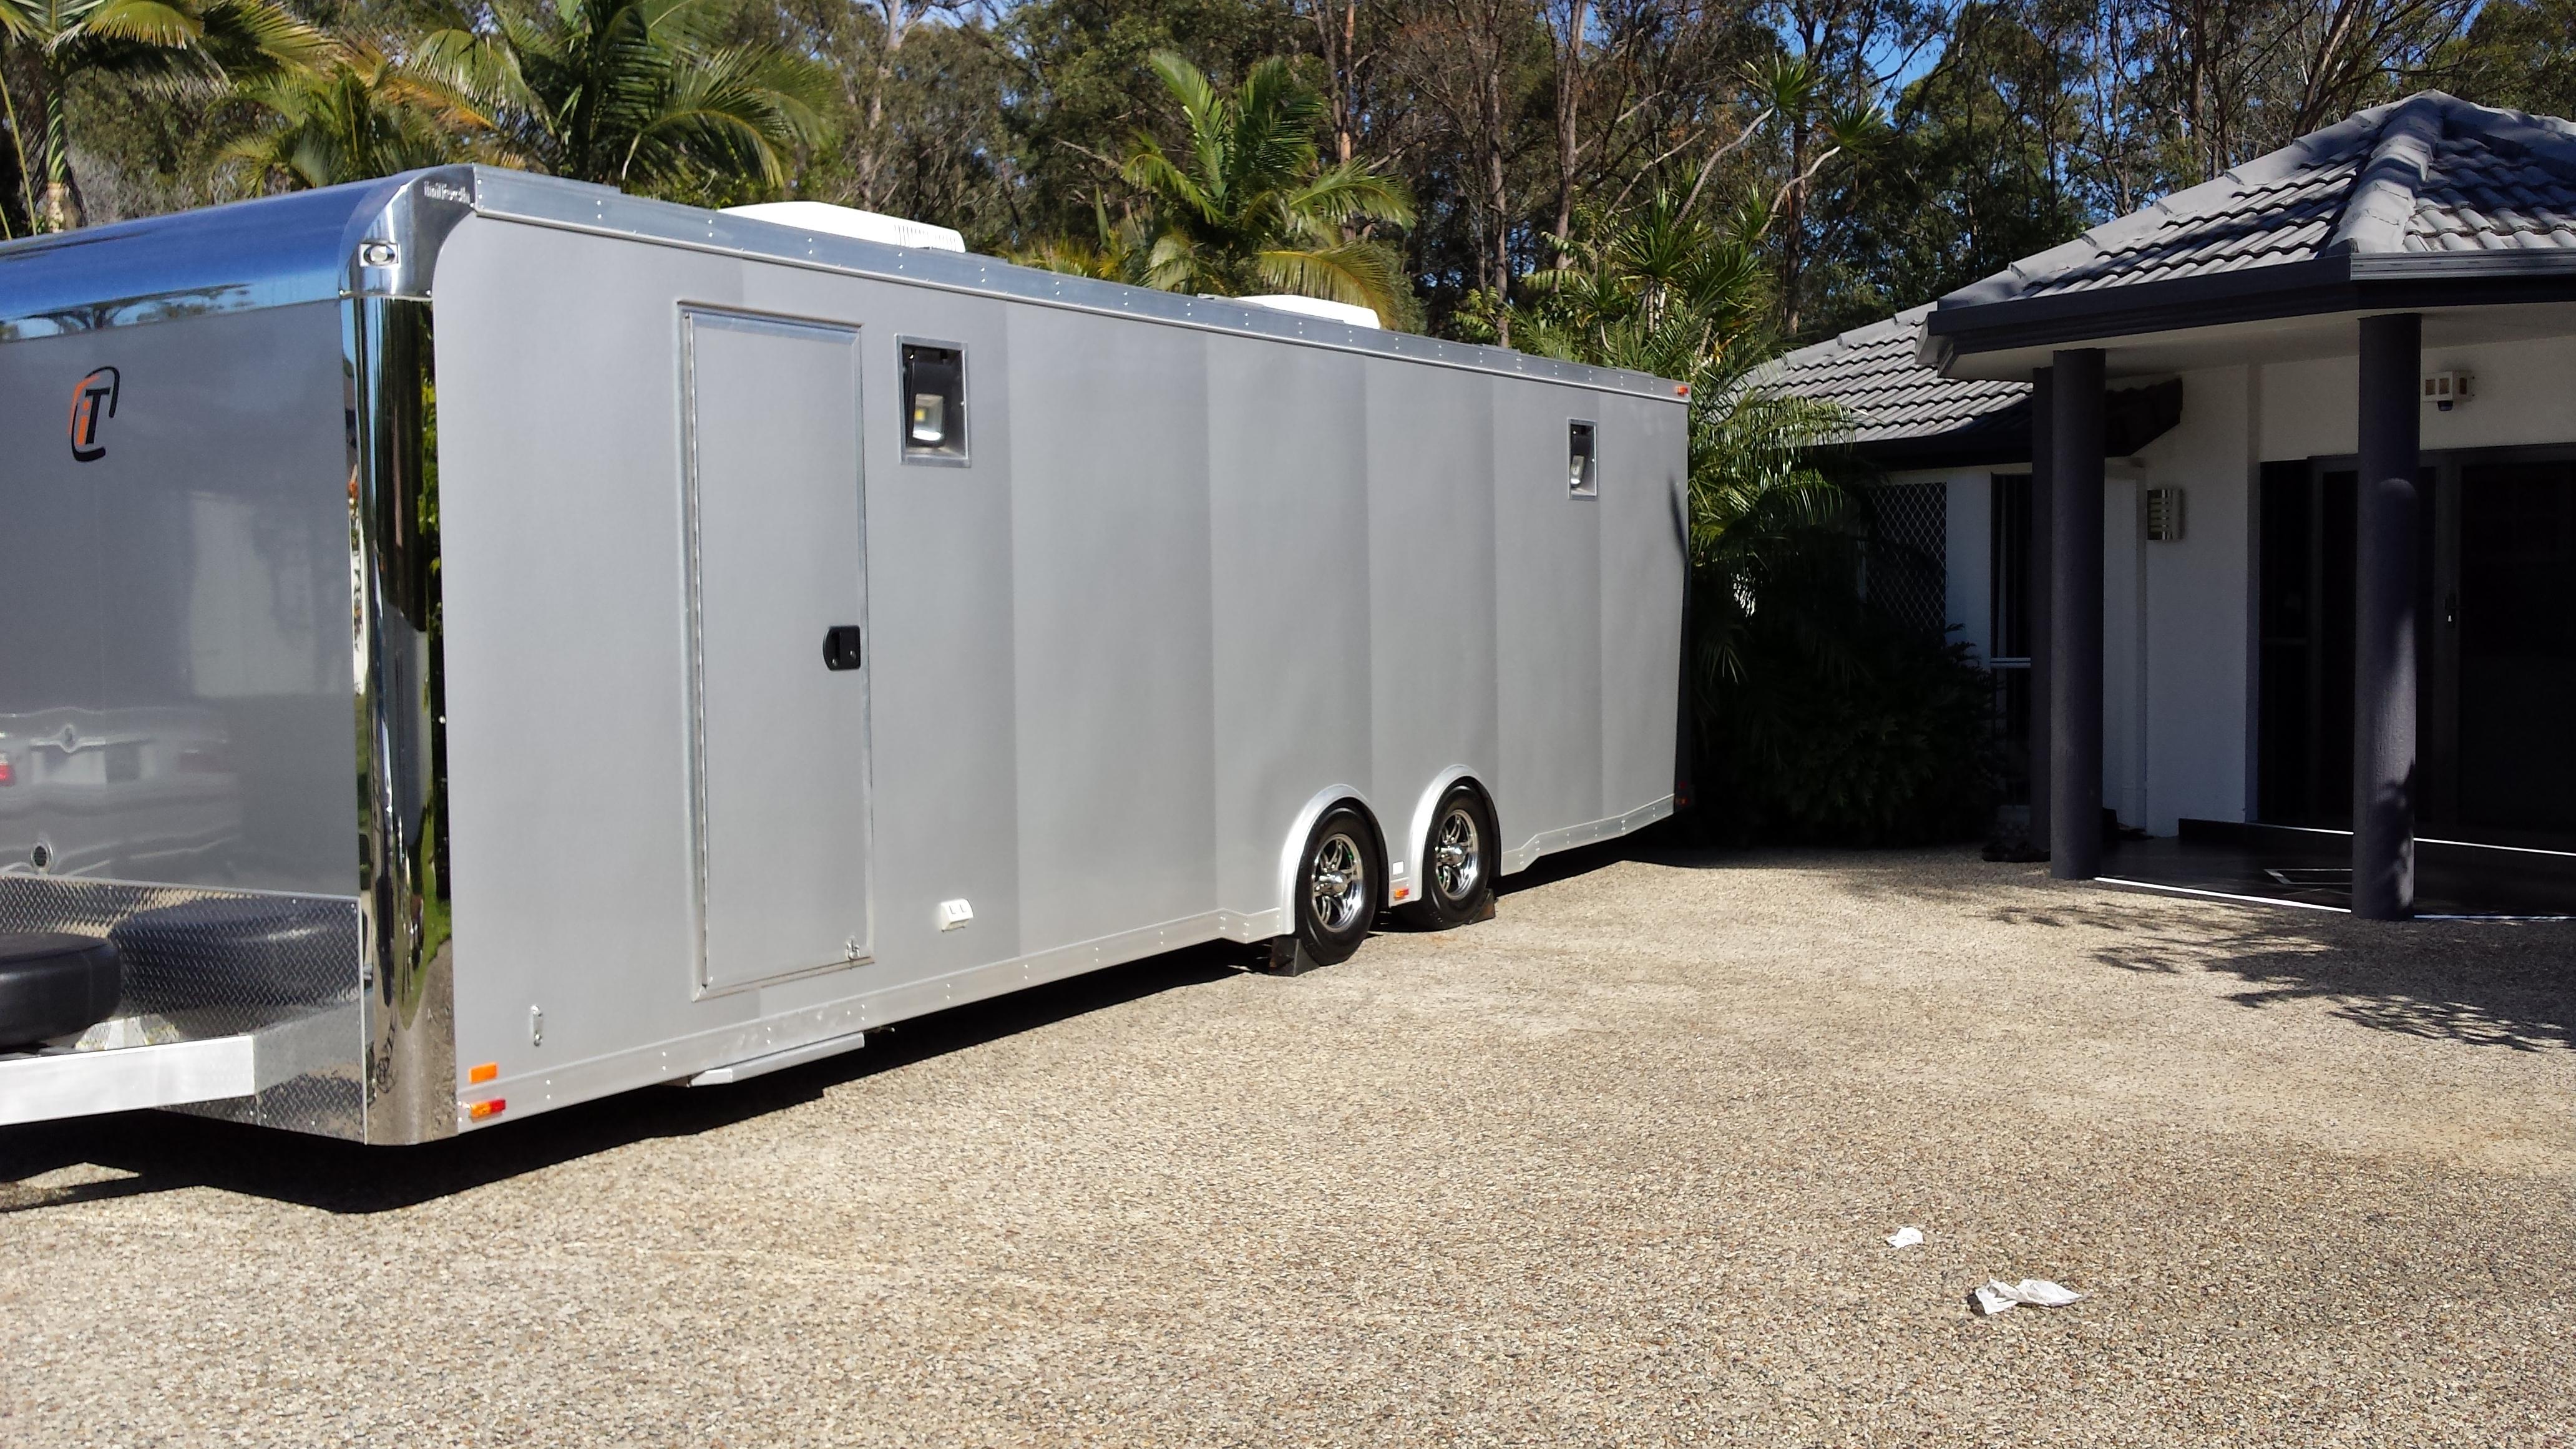 gn overview trailer horse awnings listings img of awning sport sundowner california super